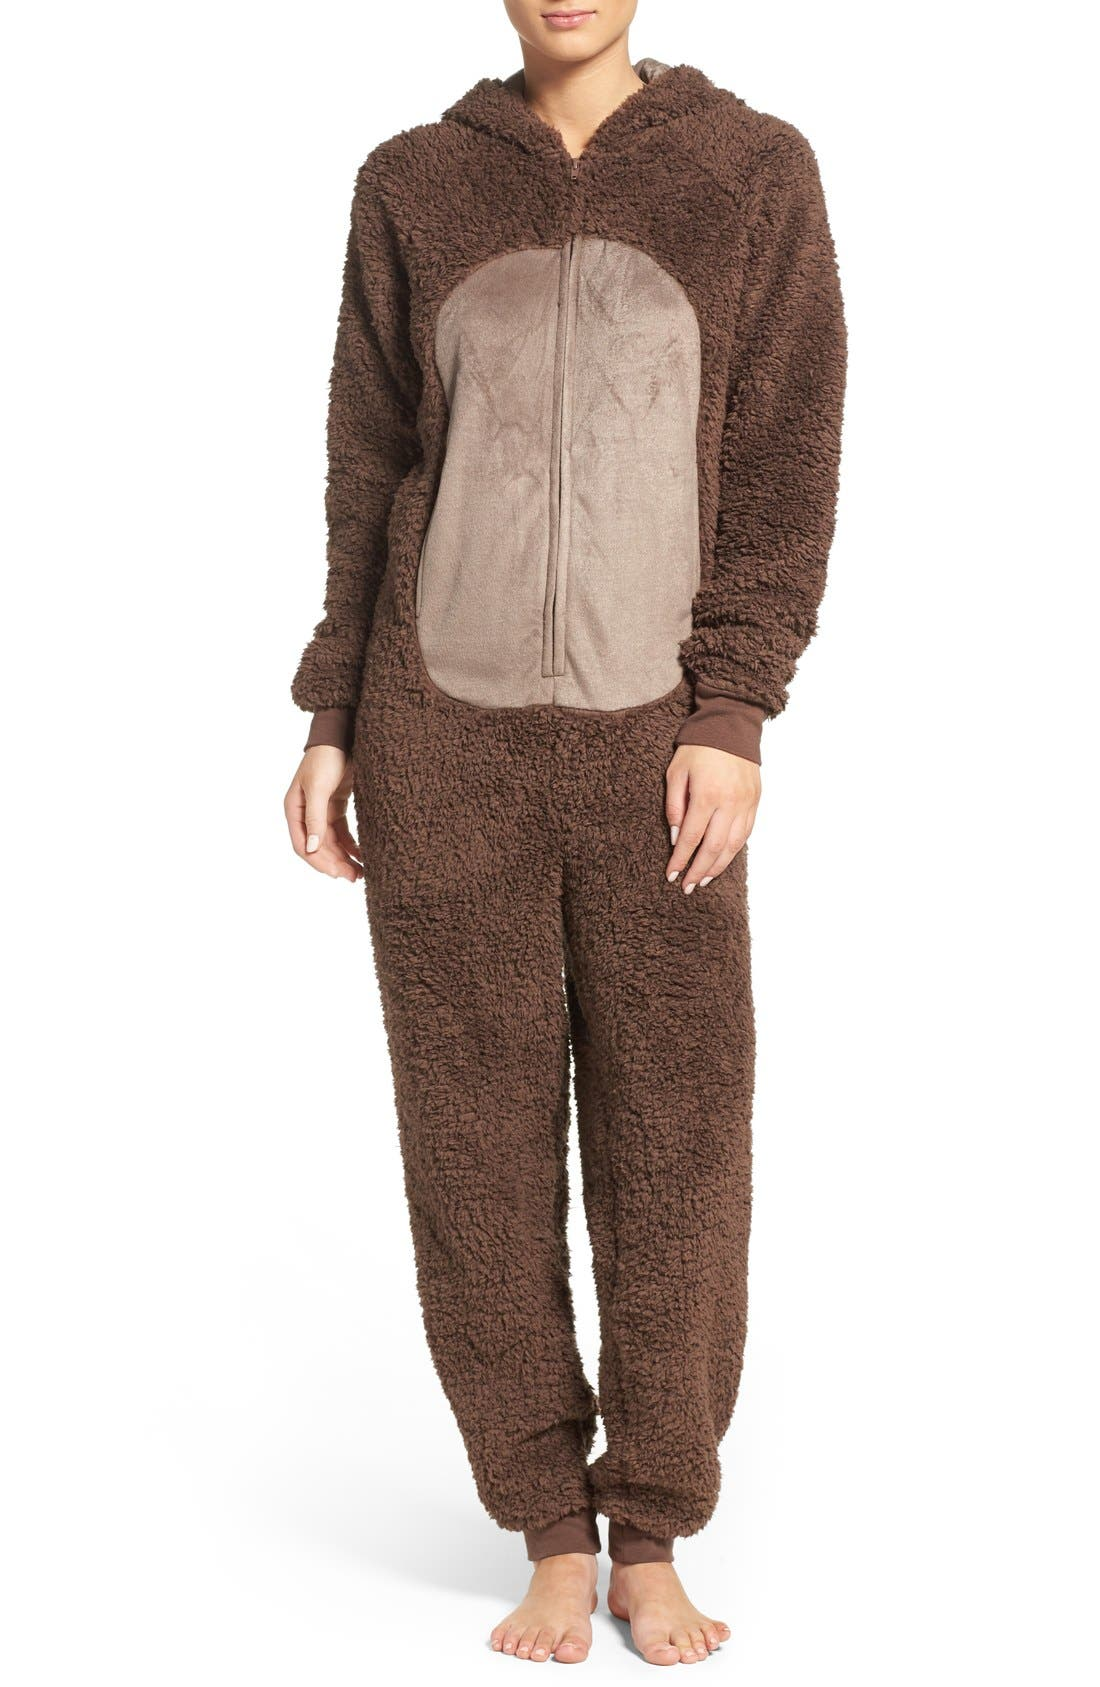 Alternate Image 1 Selected - COZY ZOE Critter One-Piece Pajamas